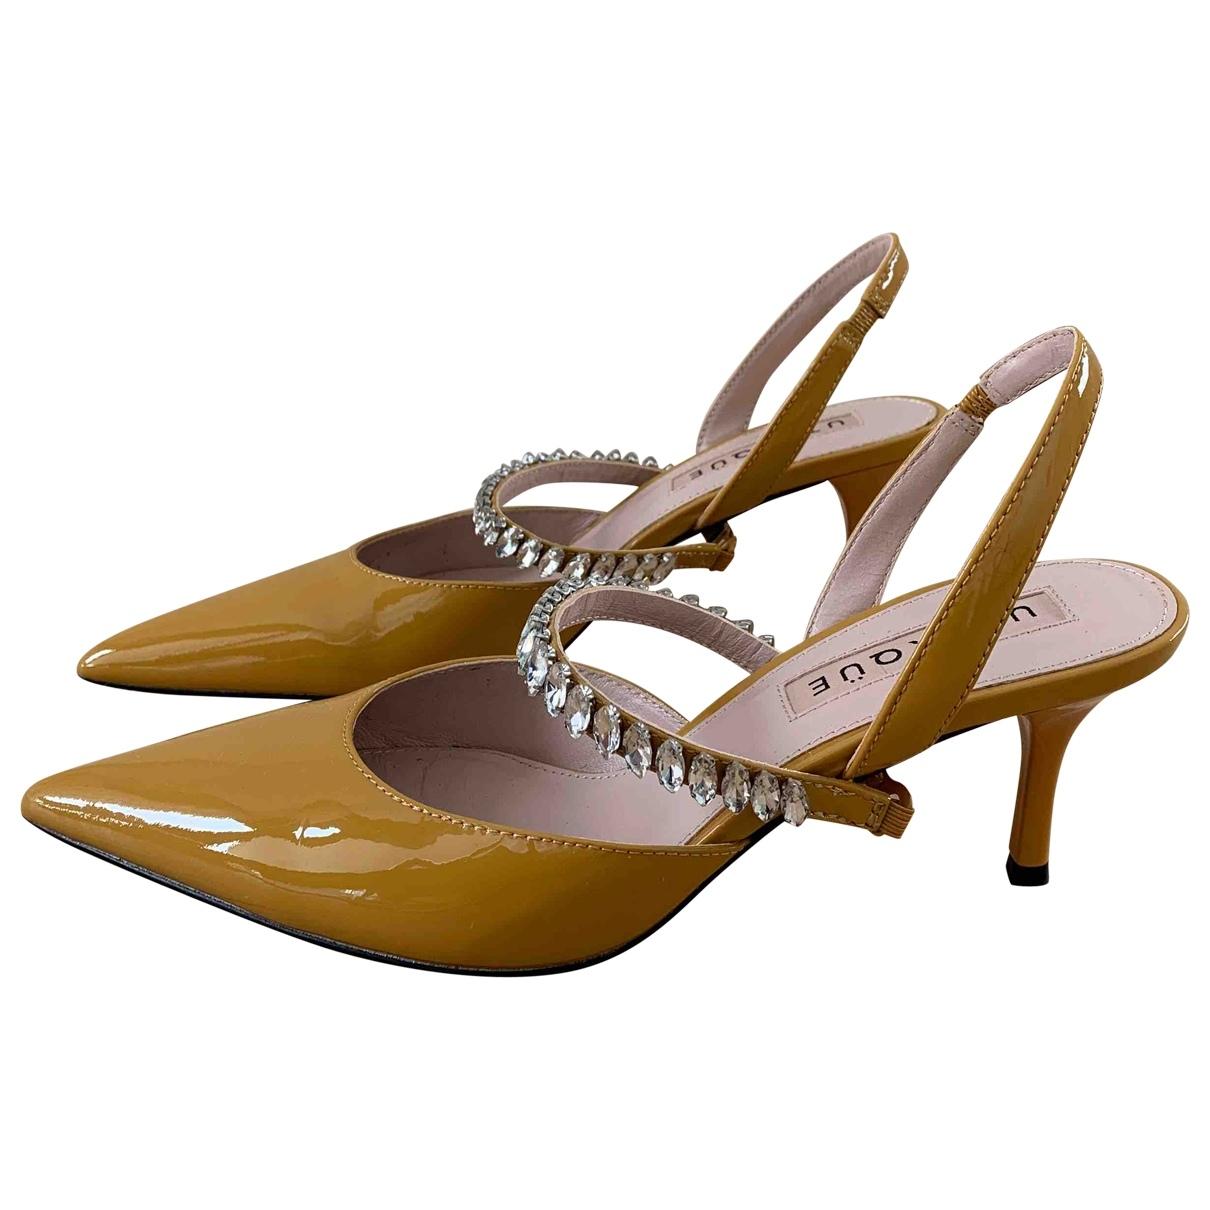 Uterque \N Sandalen in  Gelb Lackleder